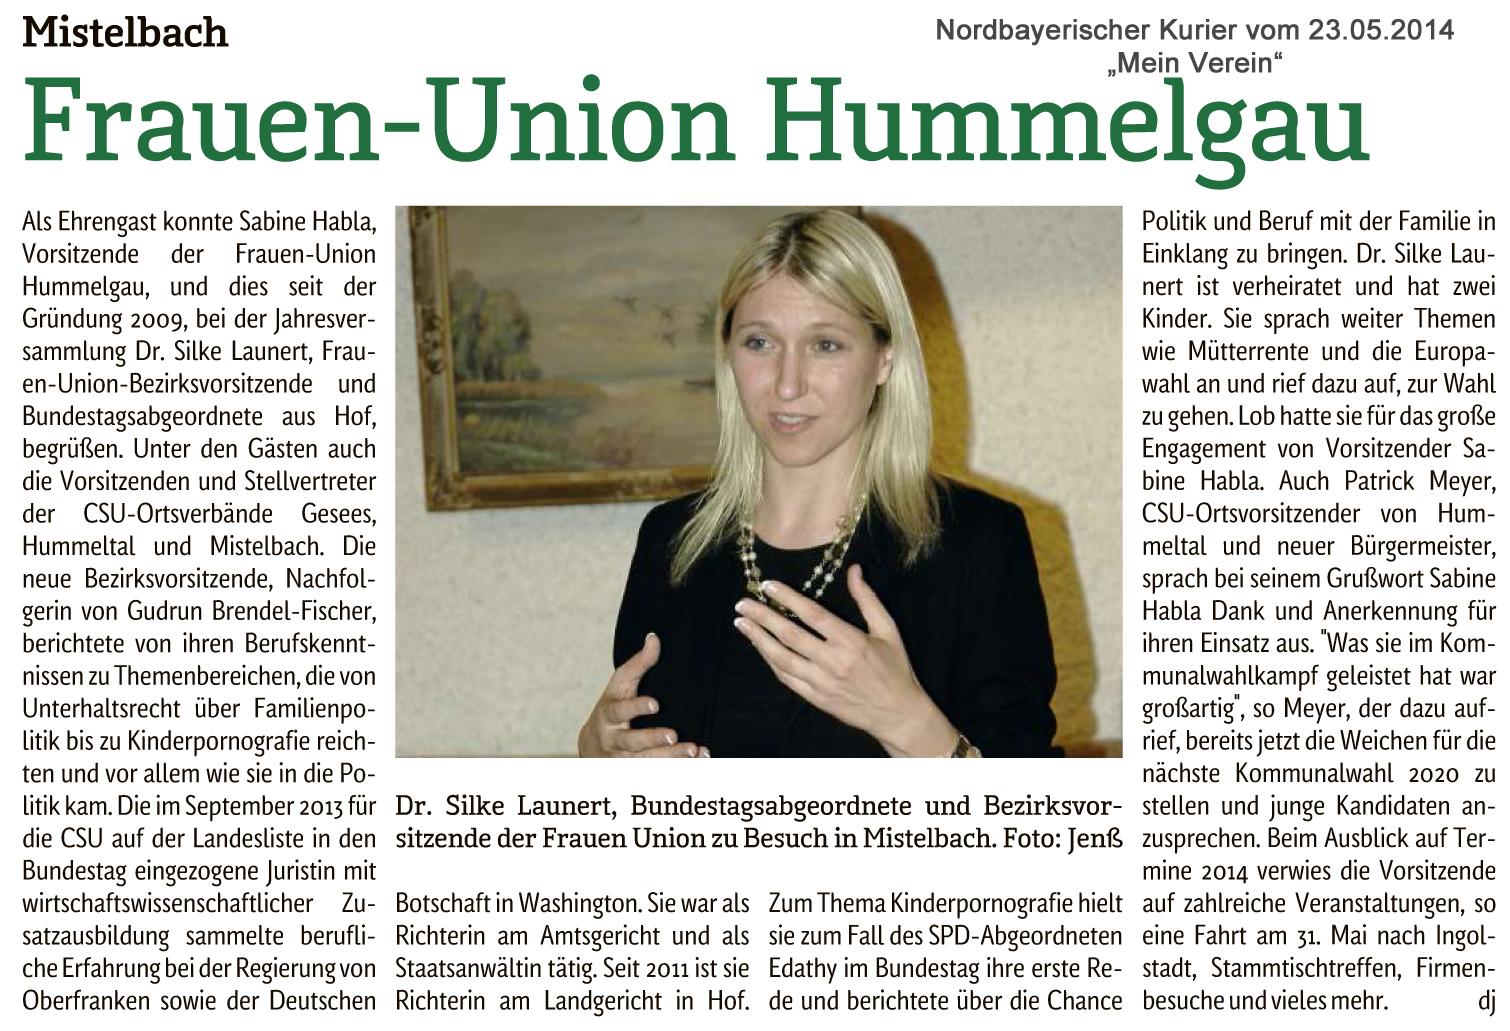 FU-Jahresversammlung_Launert_MV_23.05.14